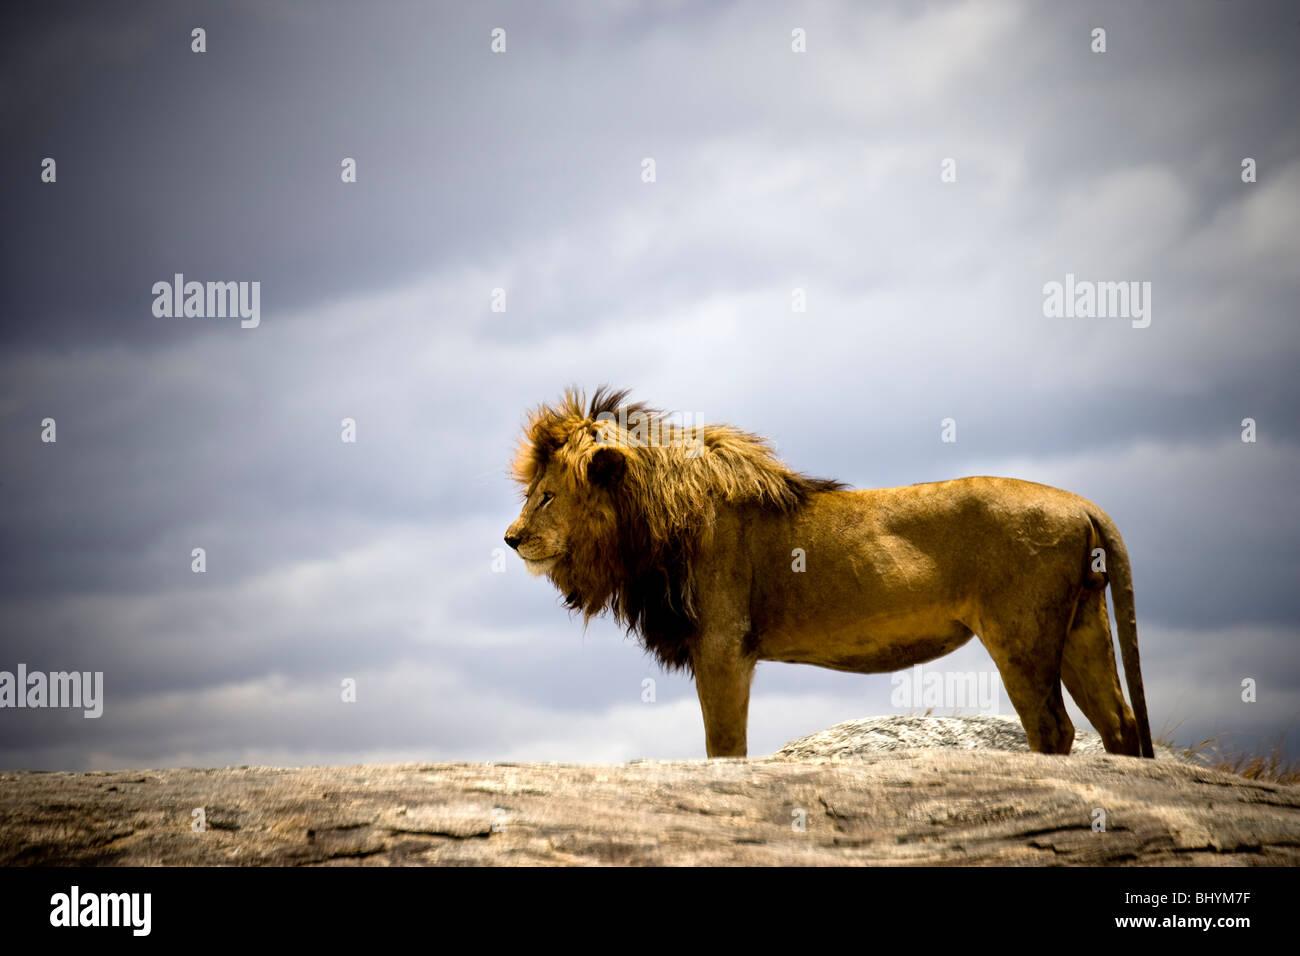 Maschio di leone, Serengeti NP, Tanzania Africa orientale Immagini Stock